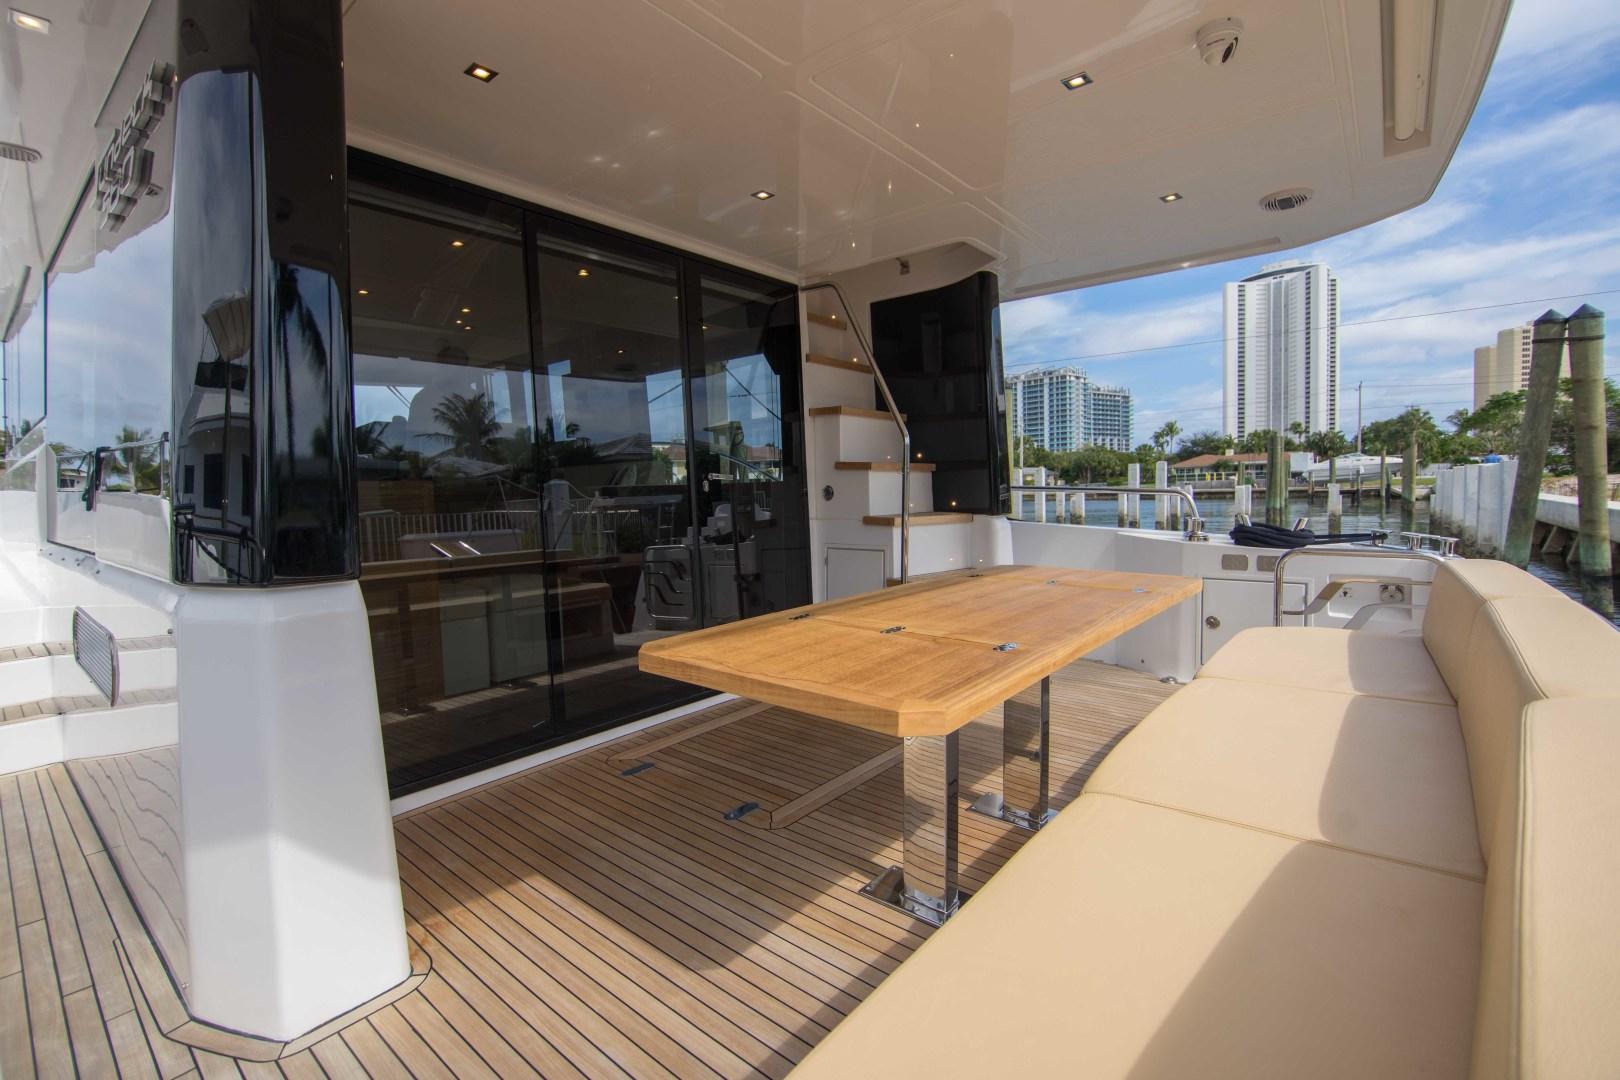 Sundeck-58 Sport 2019-LJ IV Singer Island-Florida-United States-Aft Deck-1373062 | Thumbnail